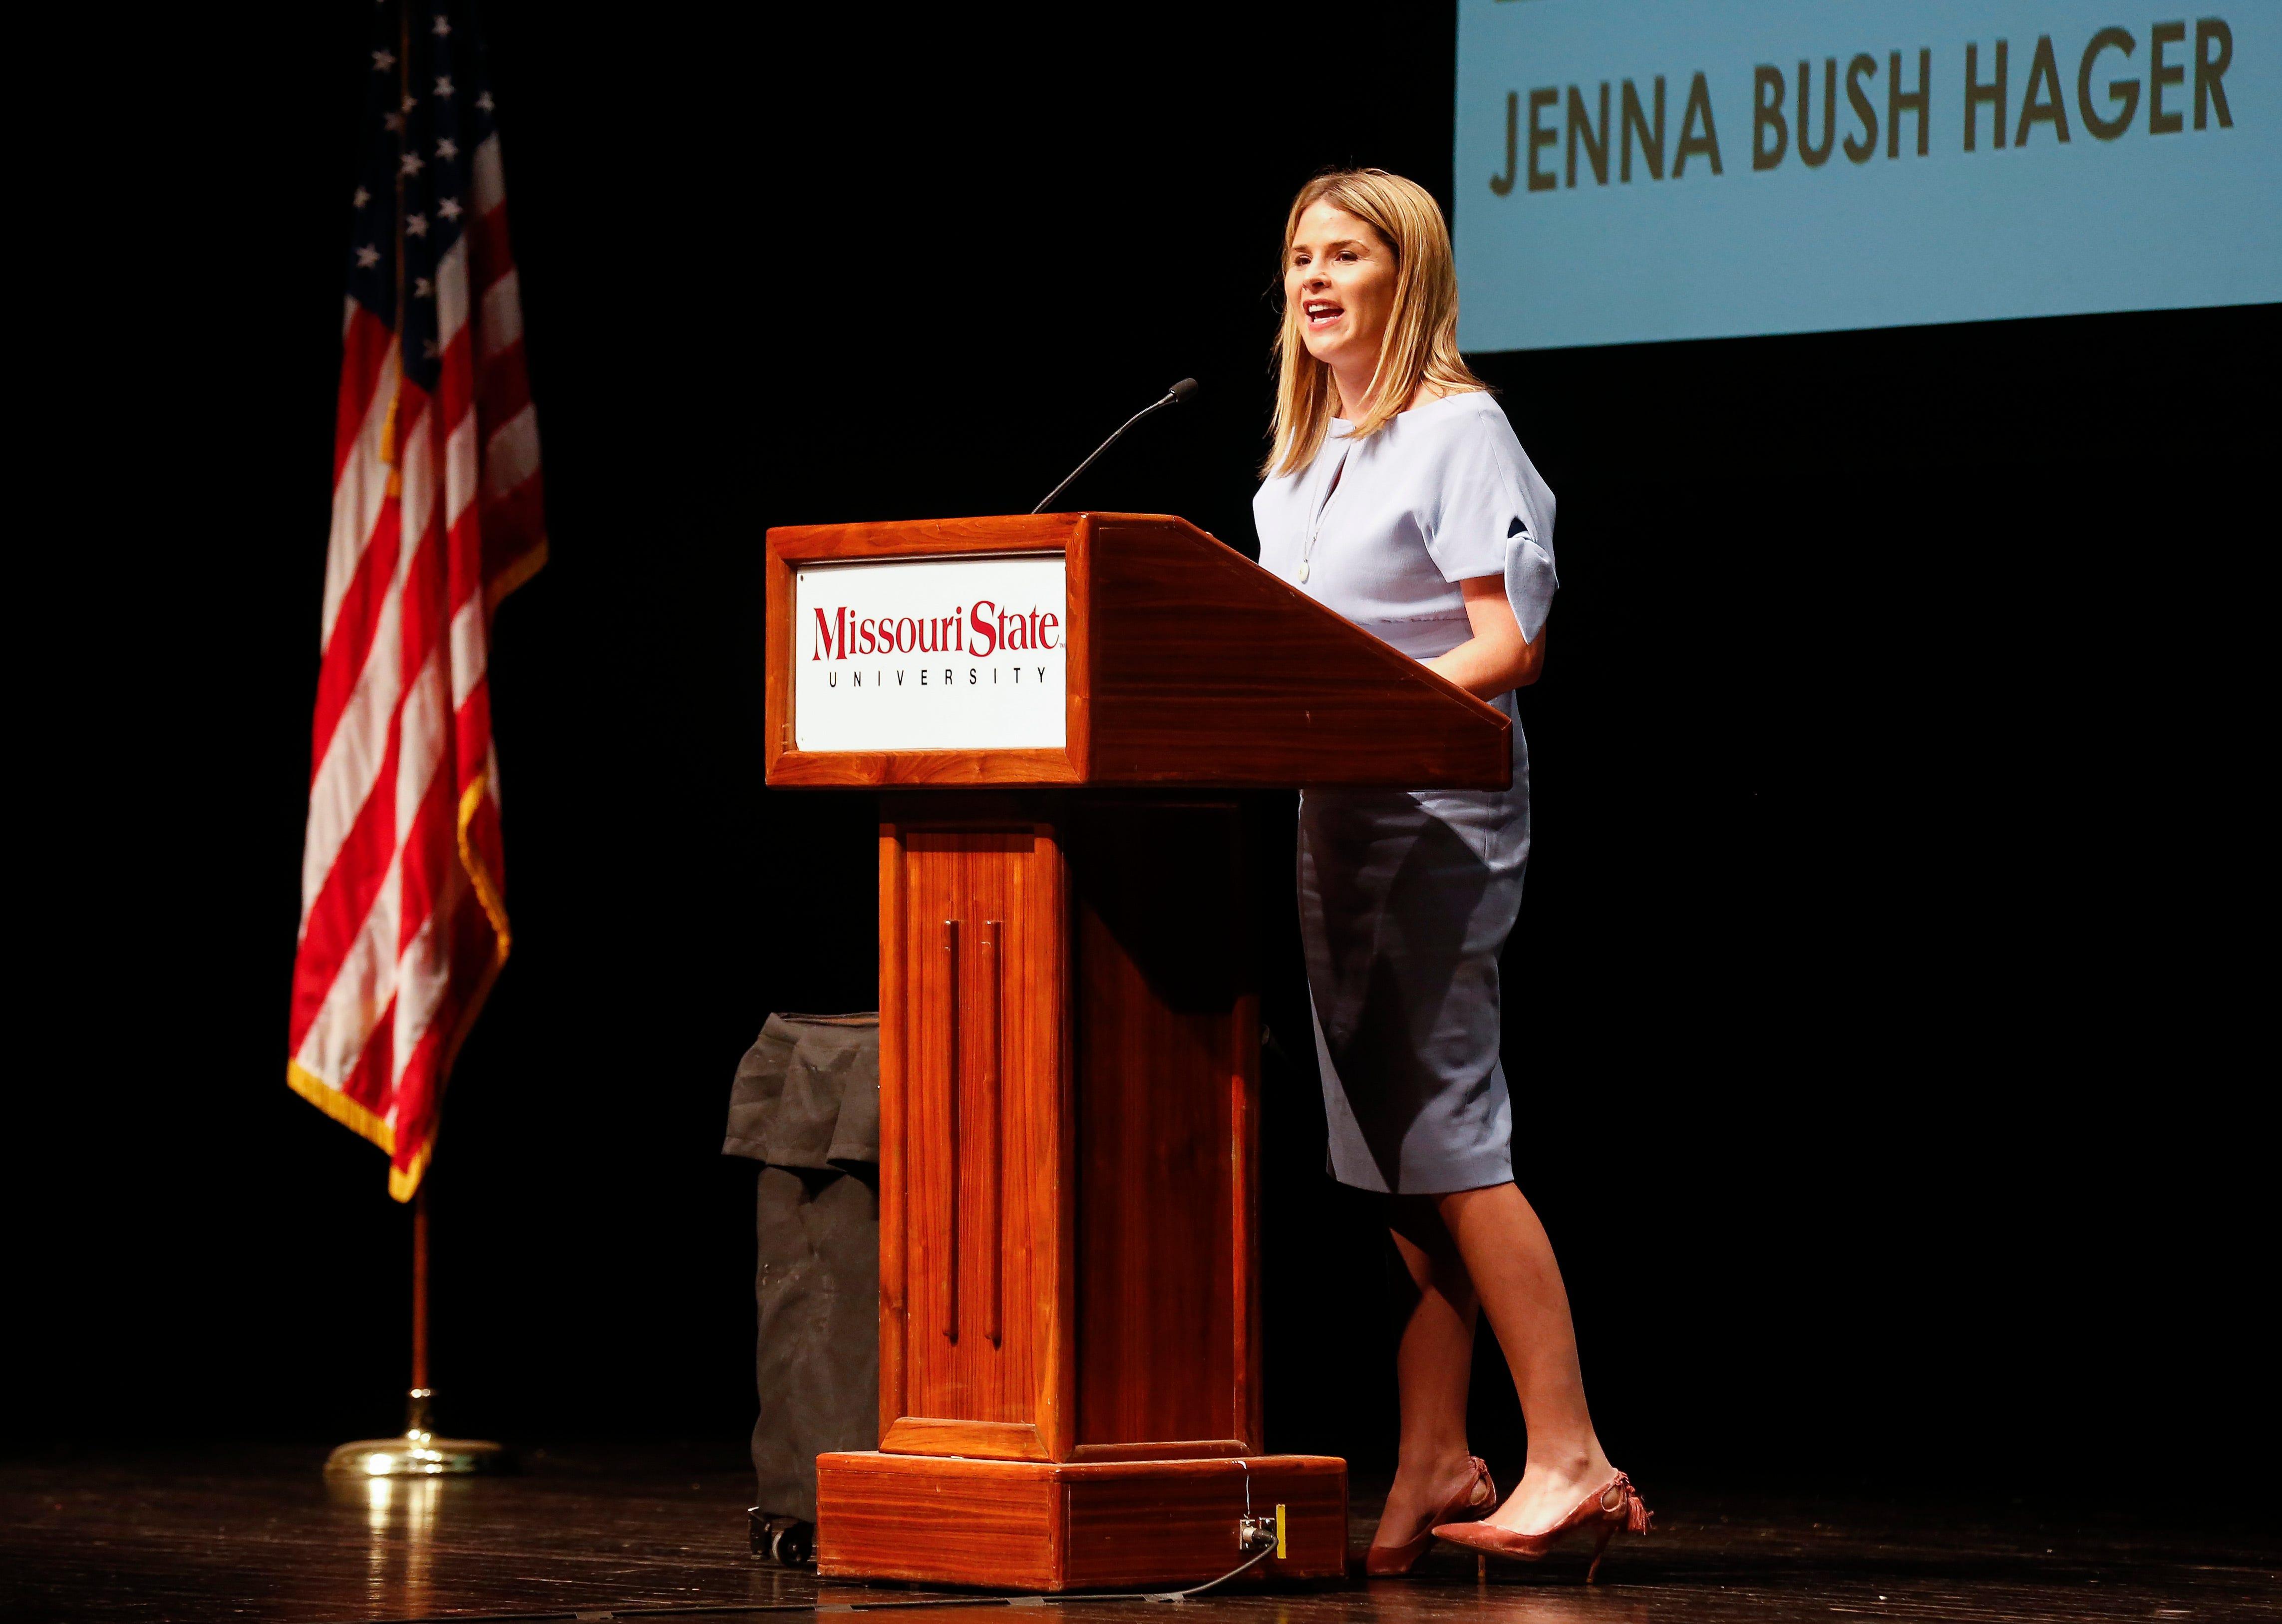 NBC's Jenna Bush Hager Missouri